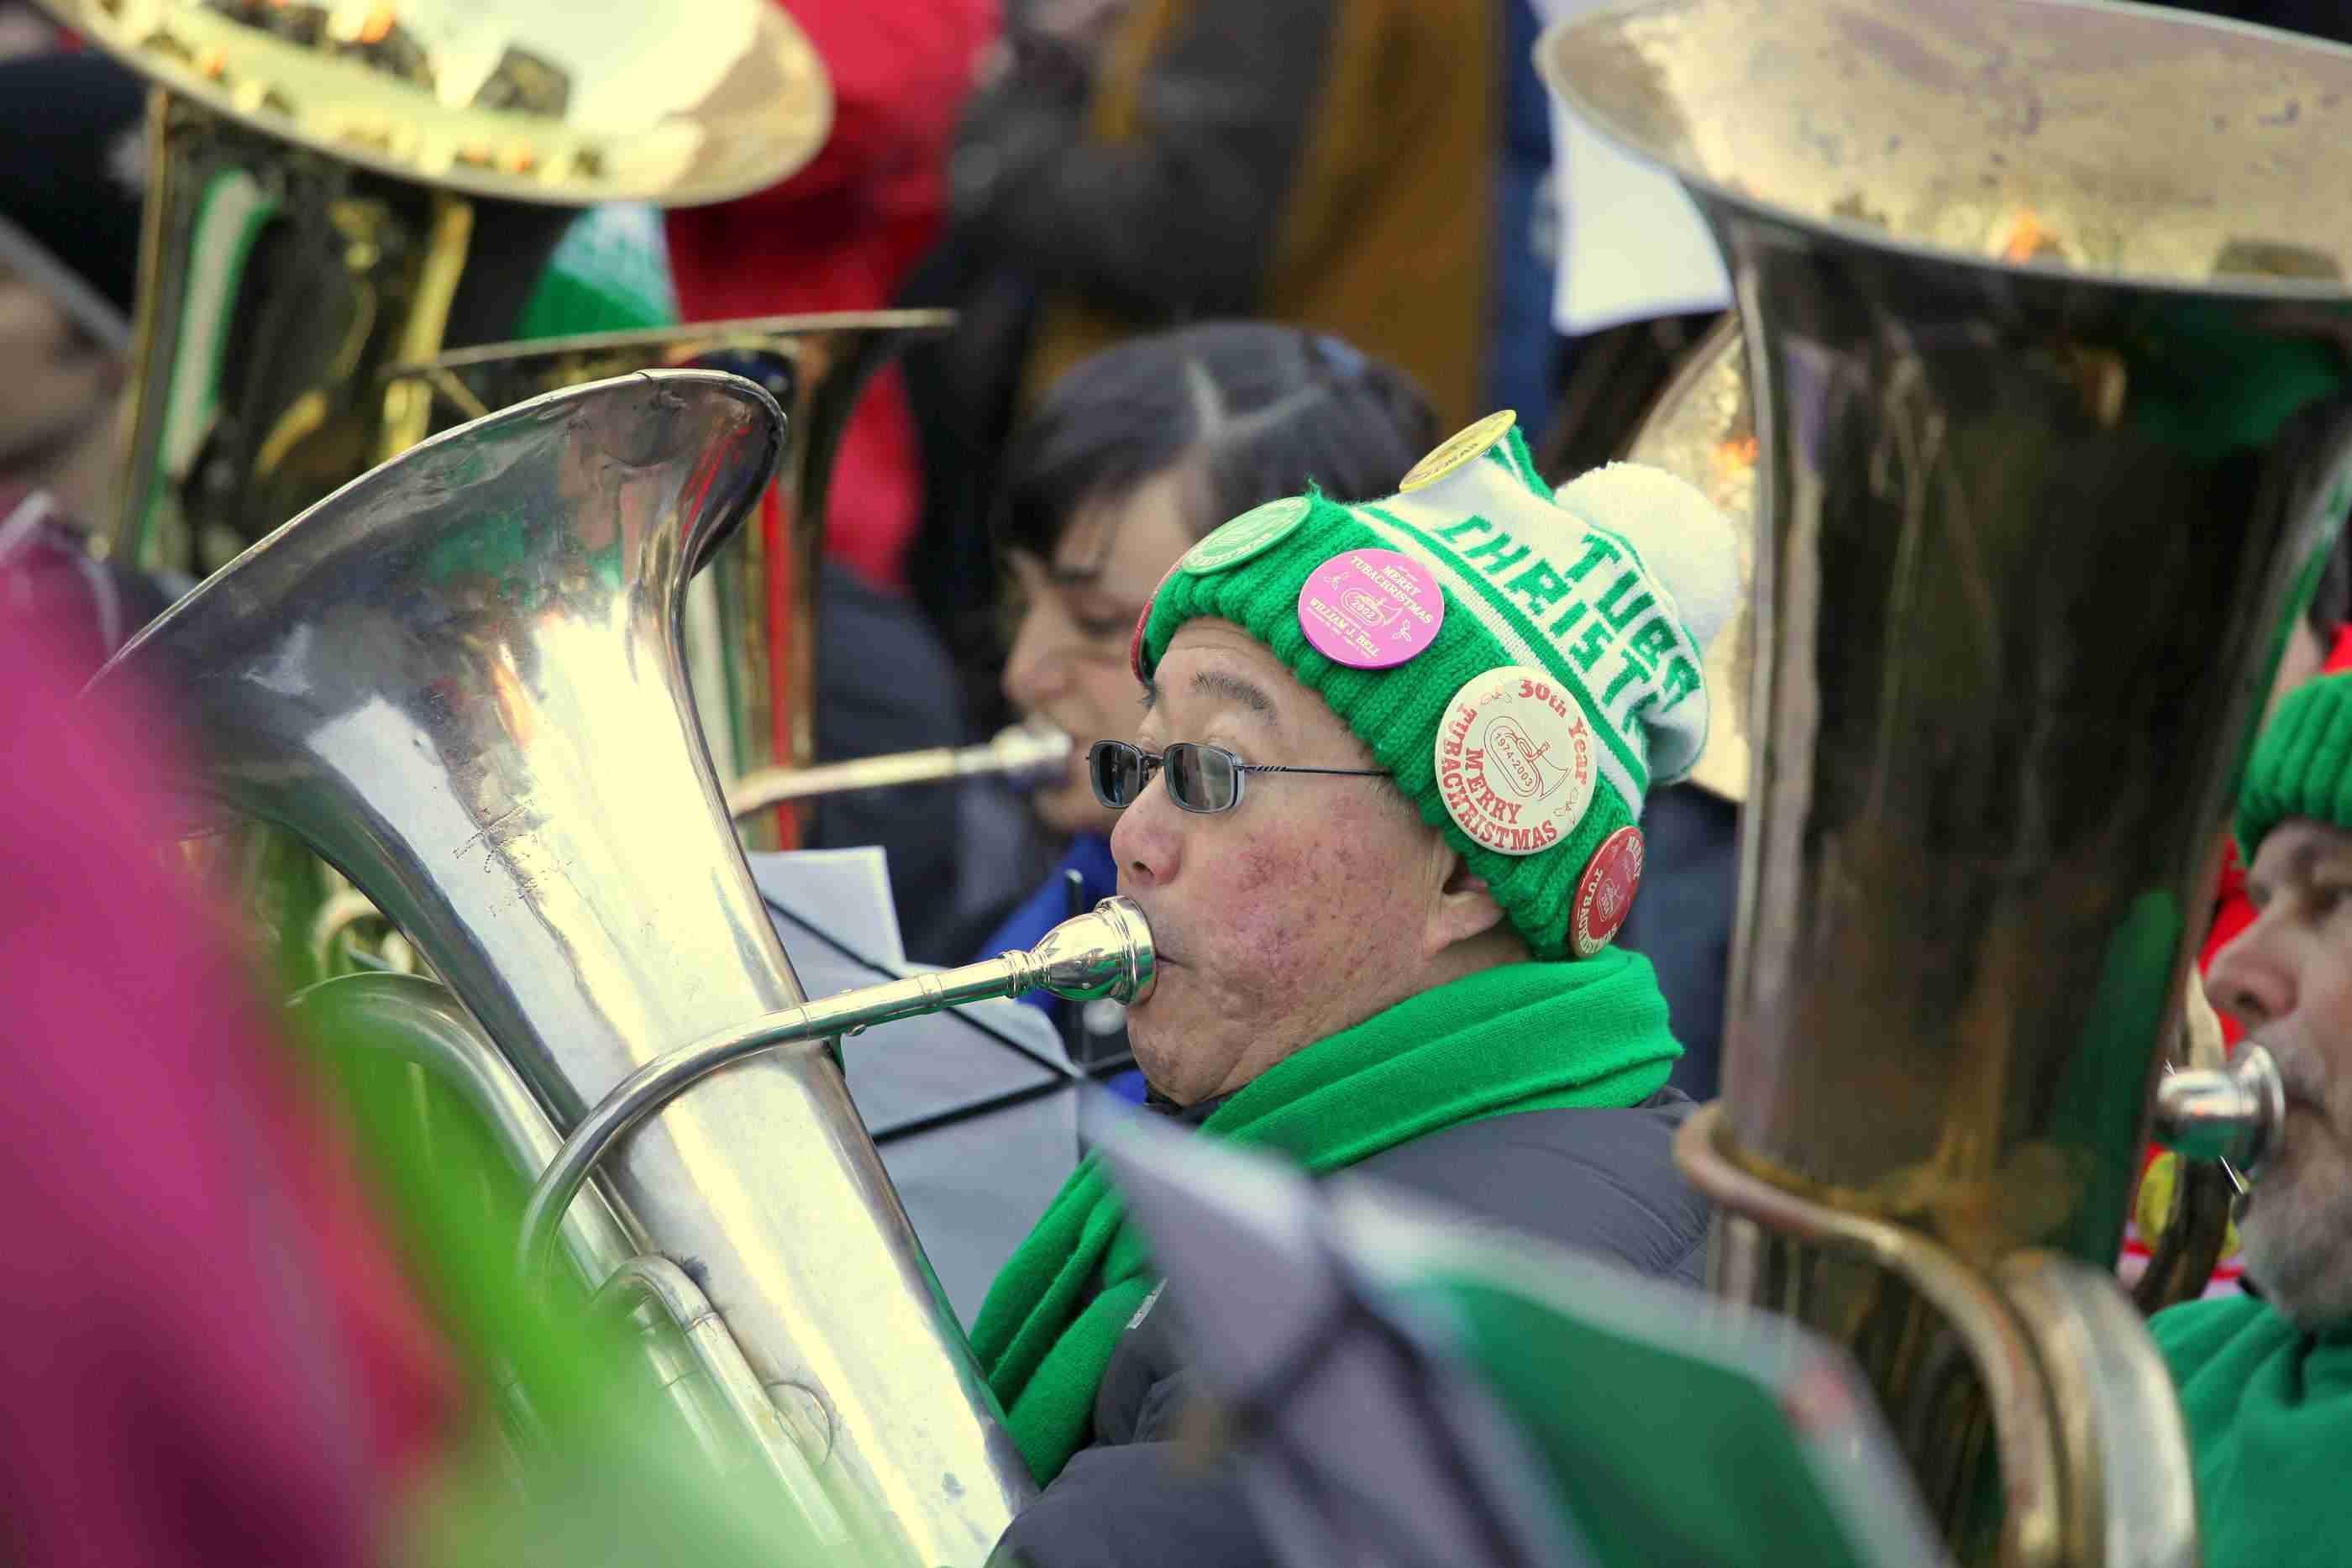 Merry Tuba Christmas 2020 Boston Boston Tuba Christmas – KCHA News